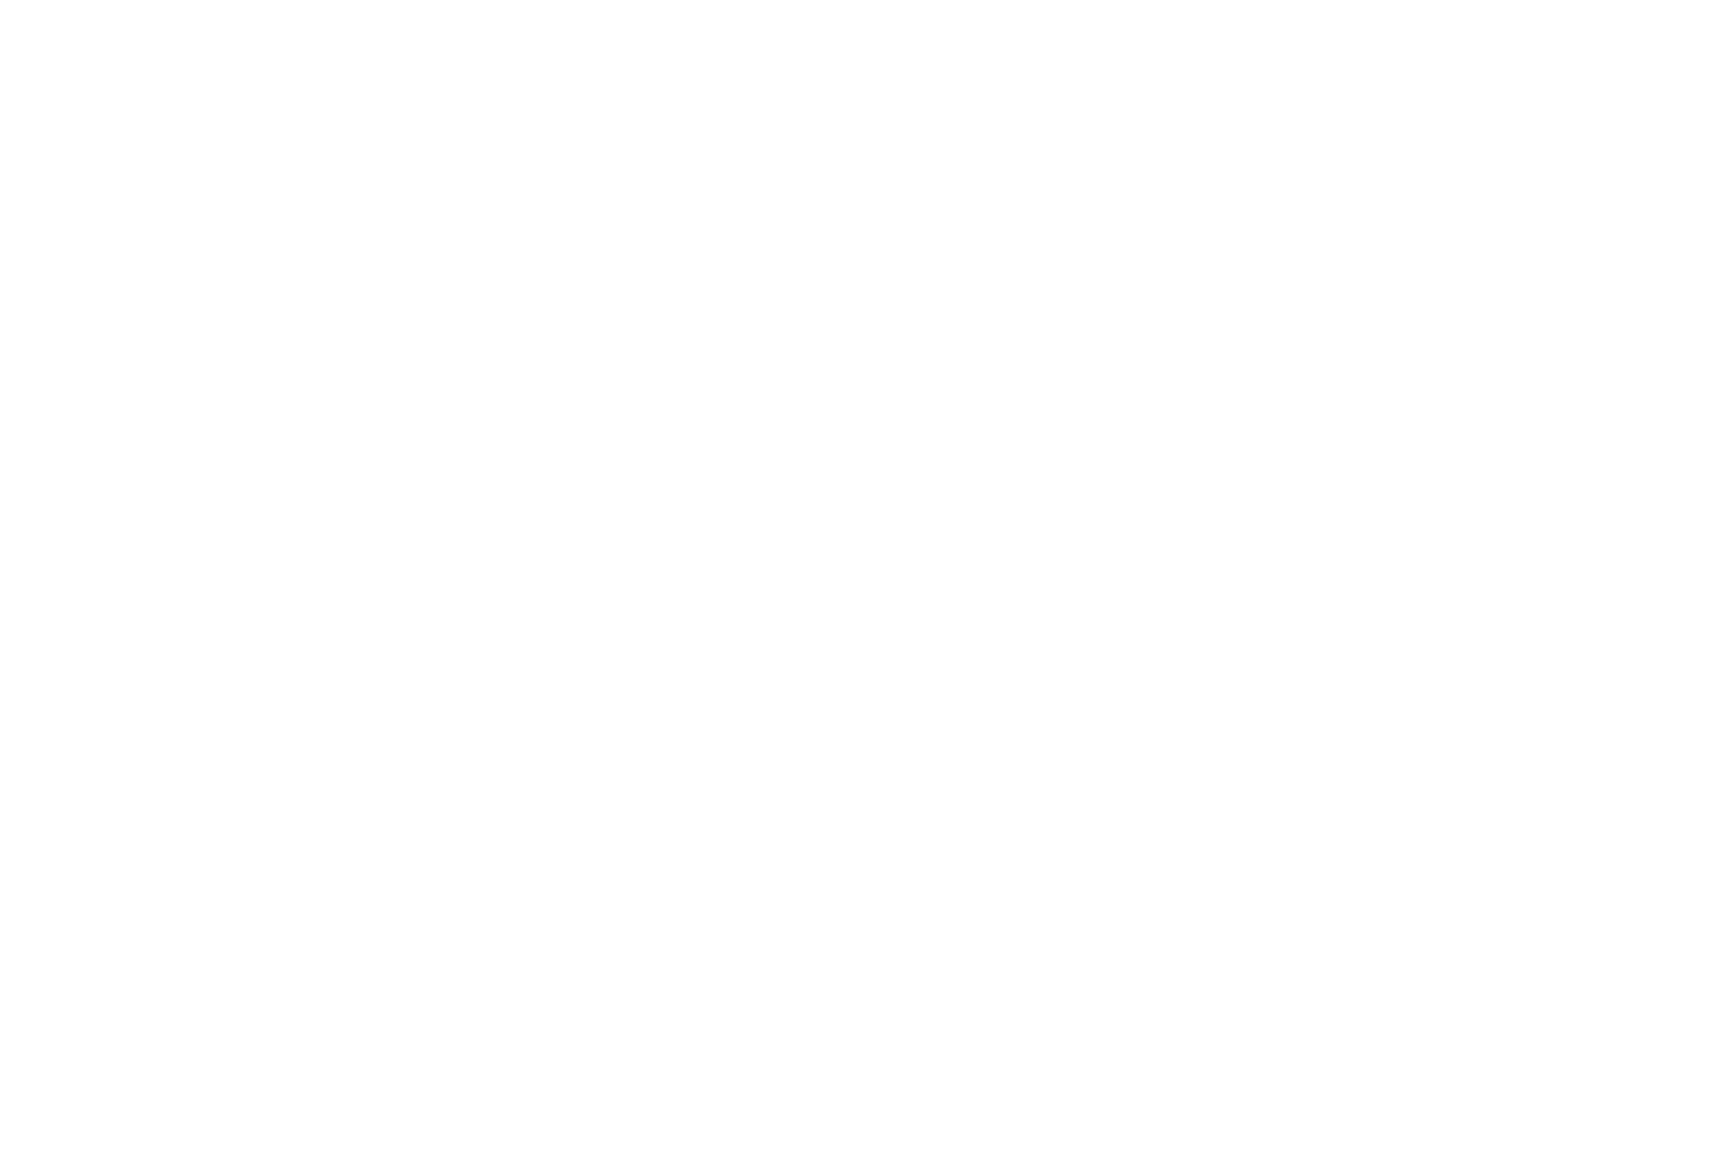 OFFICIAL SELECTION - Short Cine Fest - 2019.png